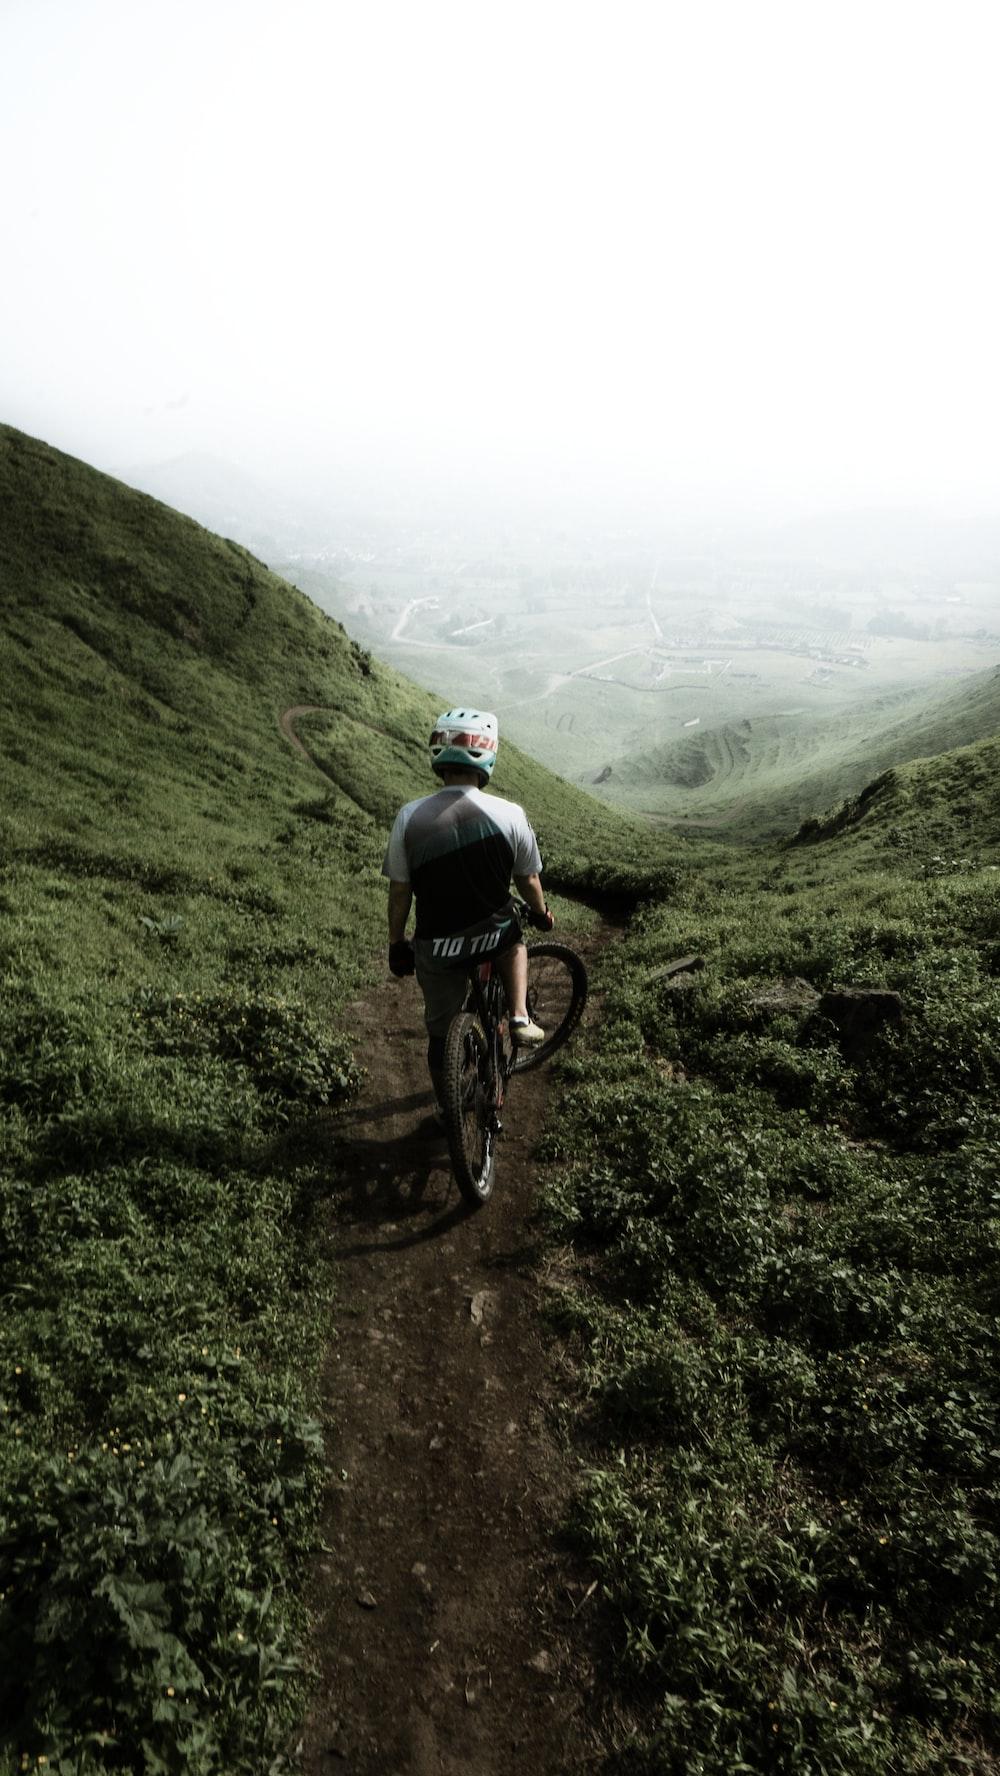 man riding bike on hill under white sky